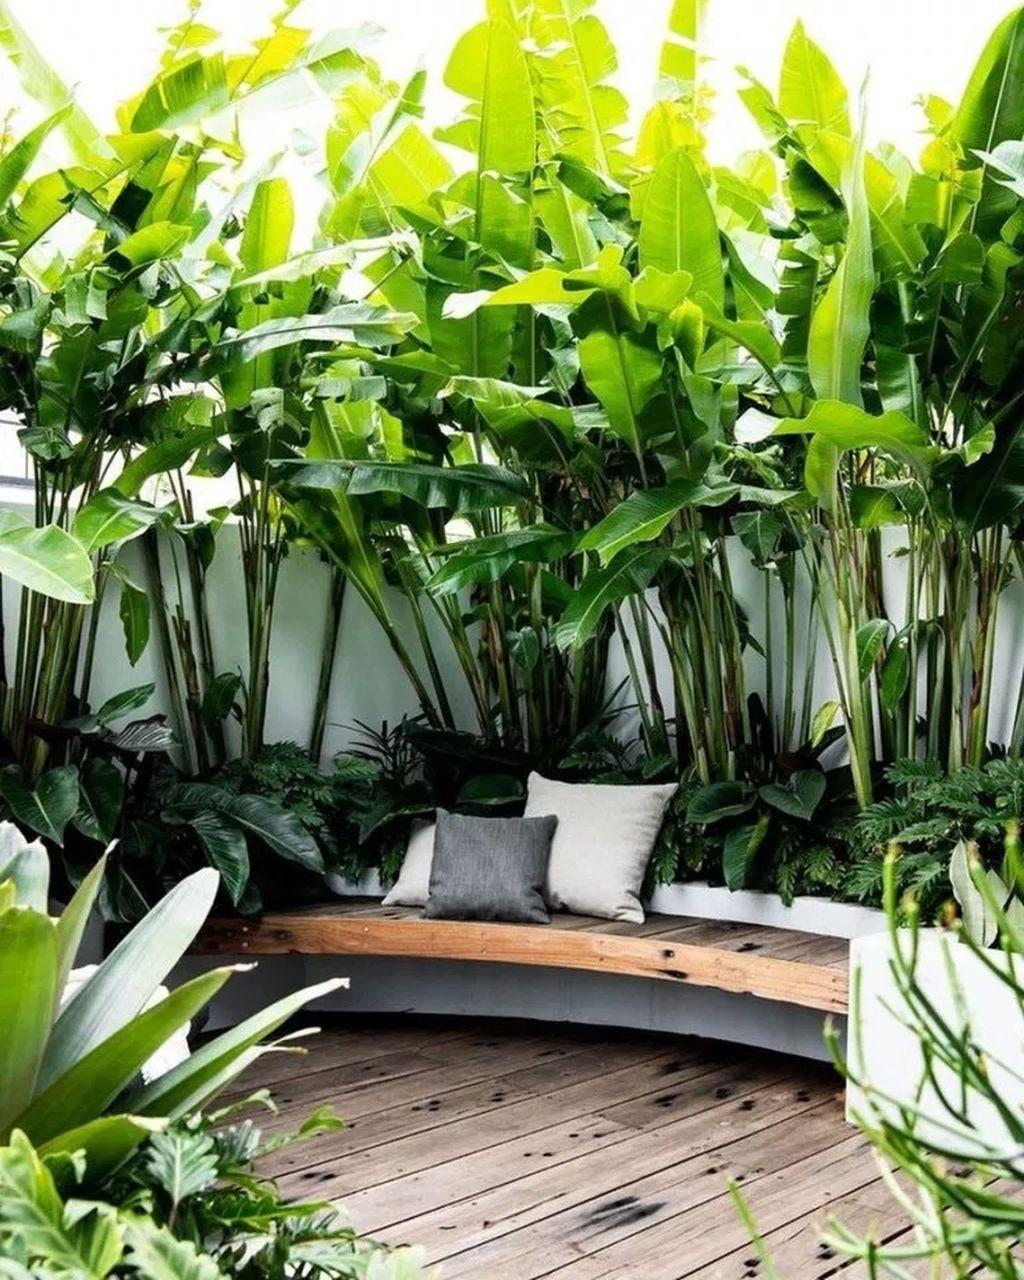 Photo of 20+ Chic Small Courtyard Garden Design Ideas For You